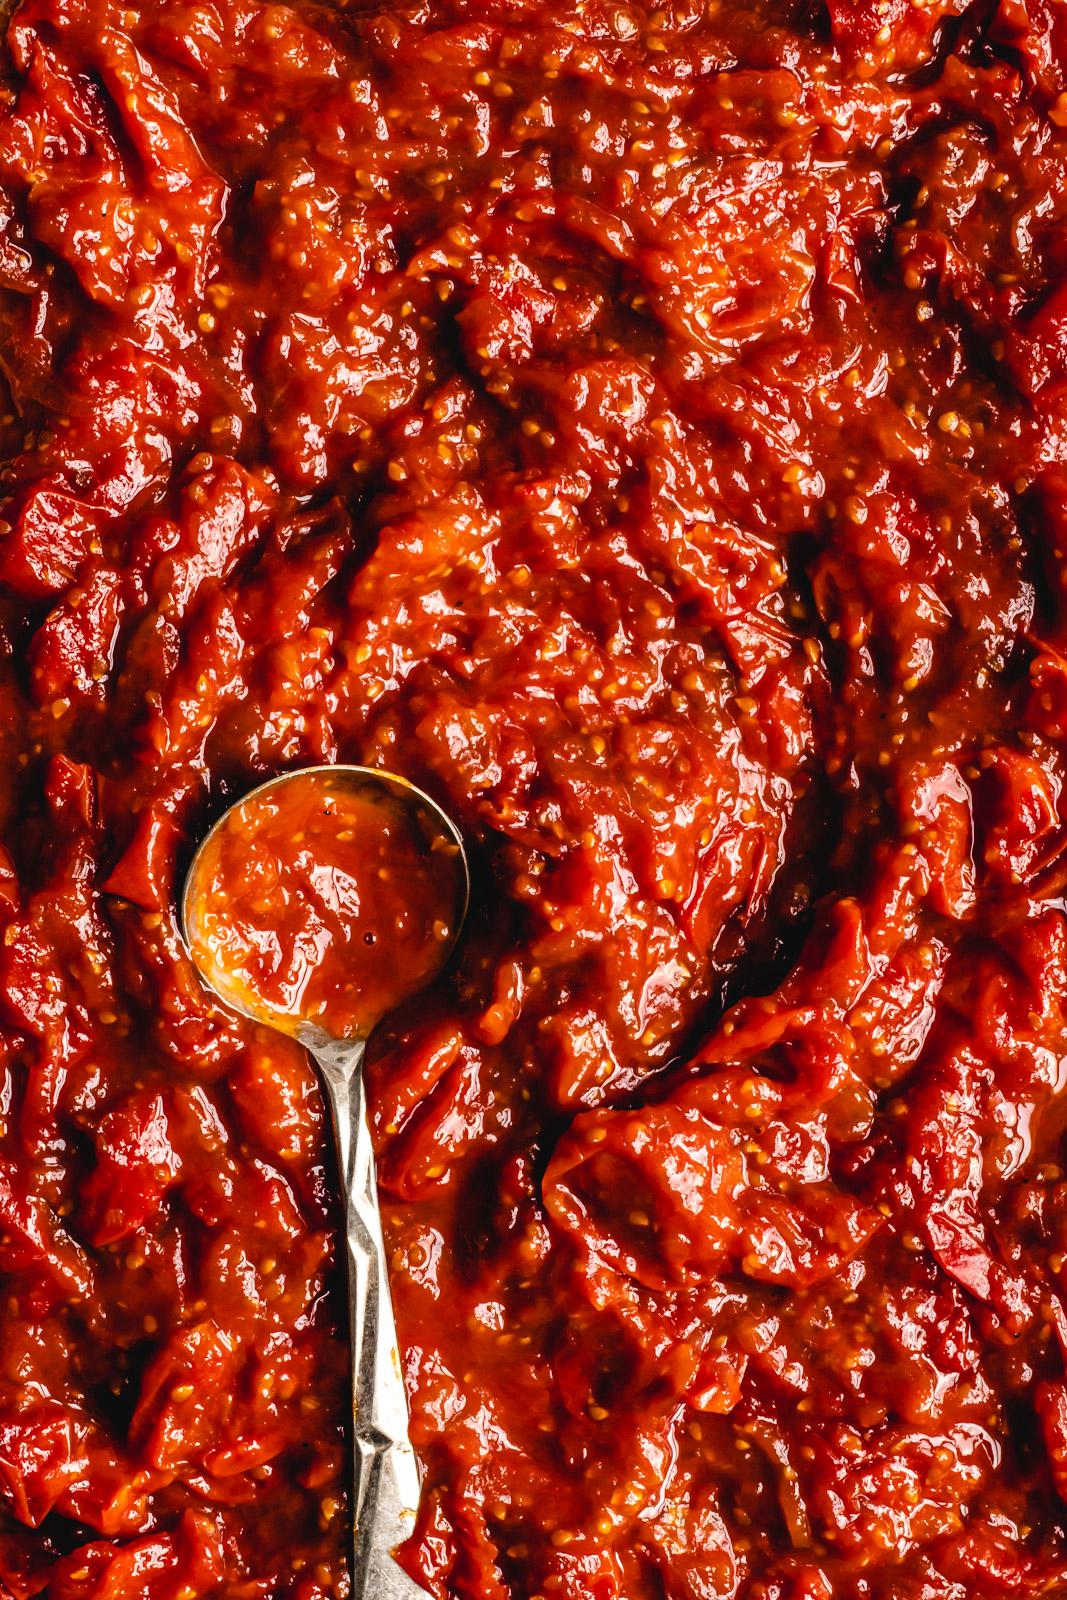 macro shot of cherry tomato harissa jam with a spoon